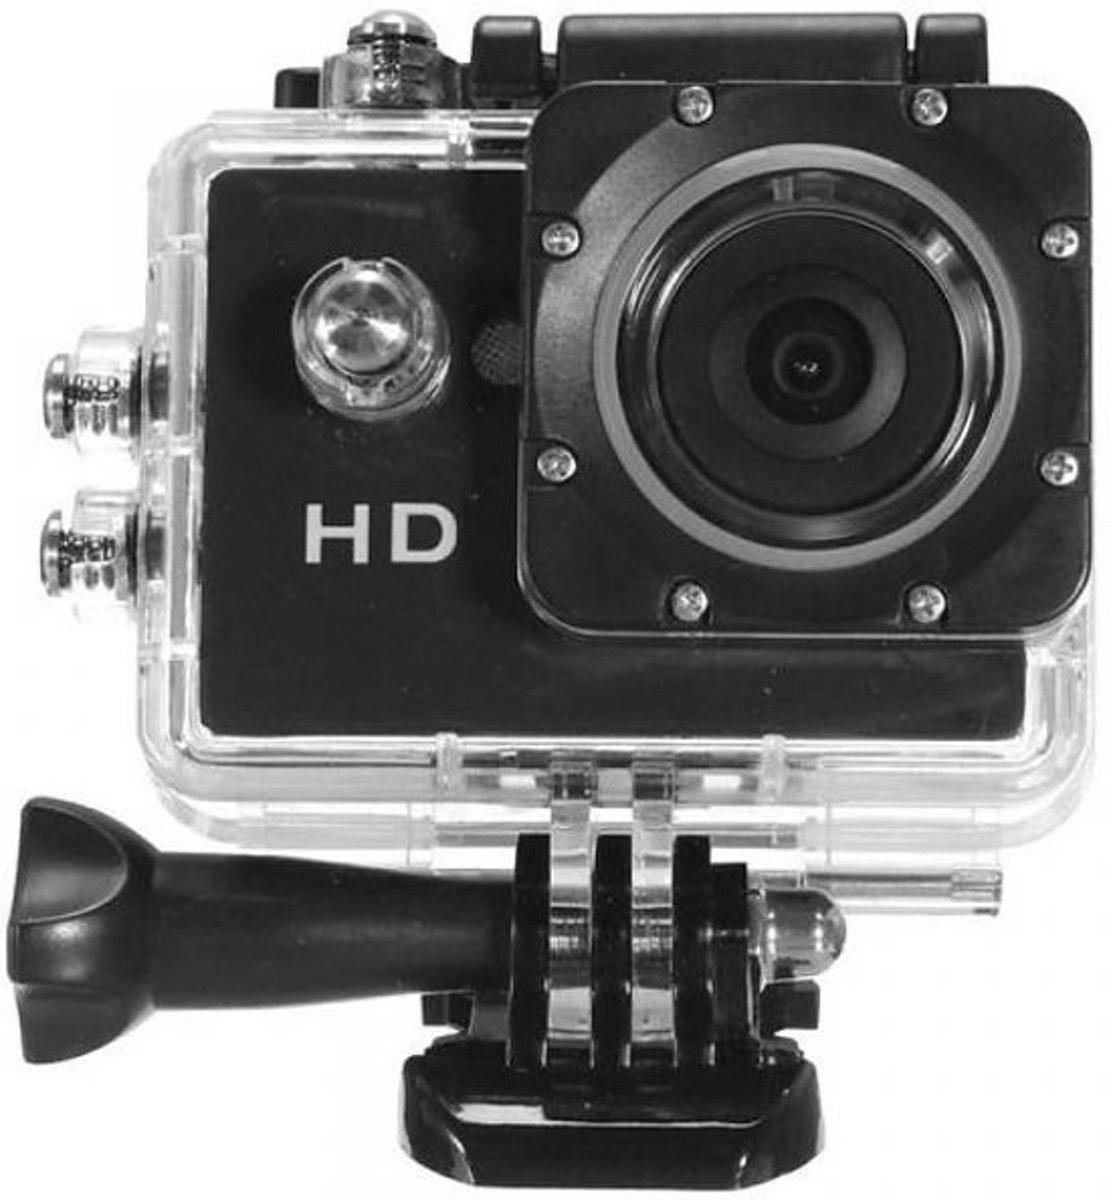 Maxx Hd Action-camera 720p Waterdicht Zwart